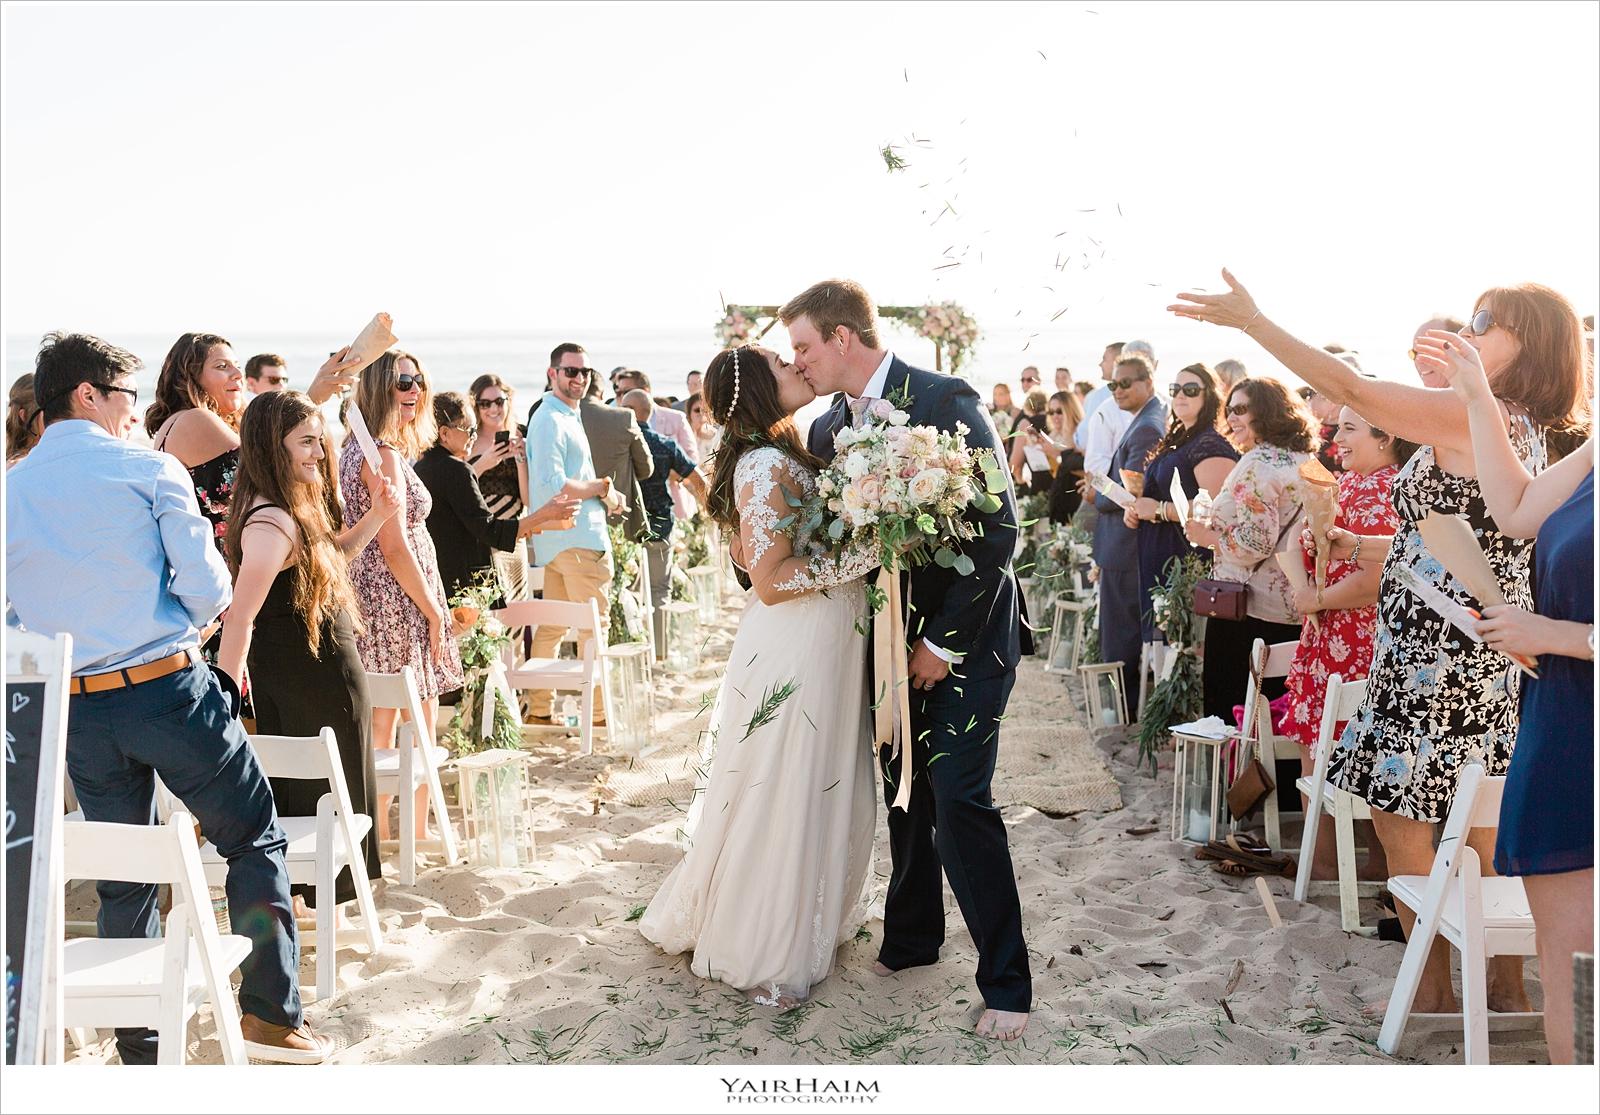 Chrystle-Robbie-wedding-photos-637.JPG